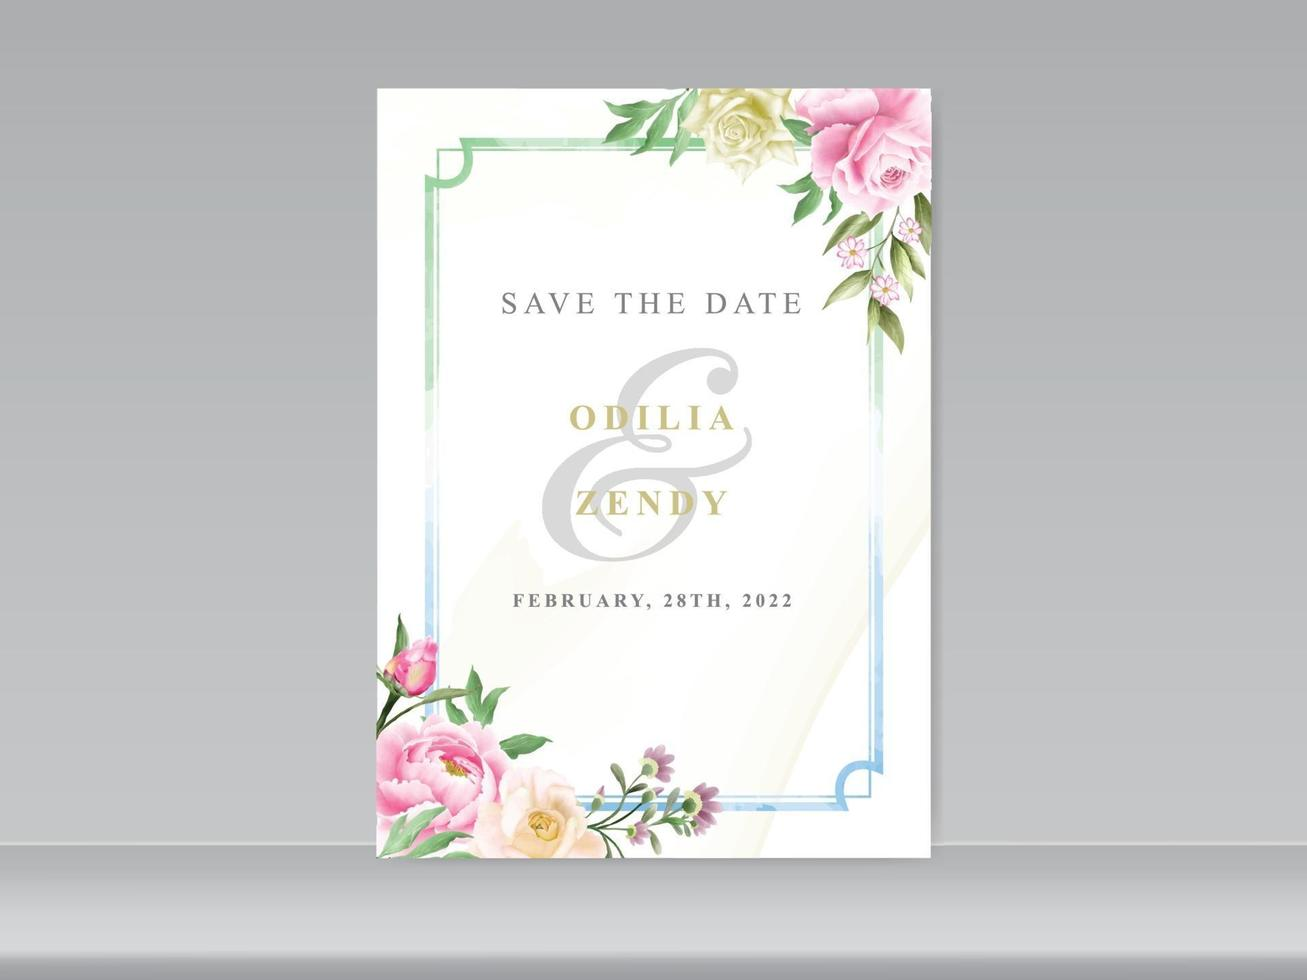 tarjeta de boda romántica floral acuarela vector